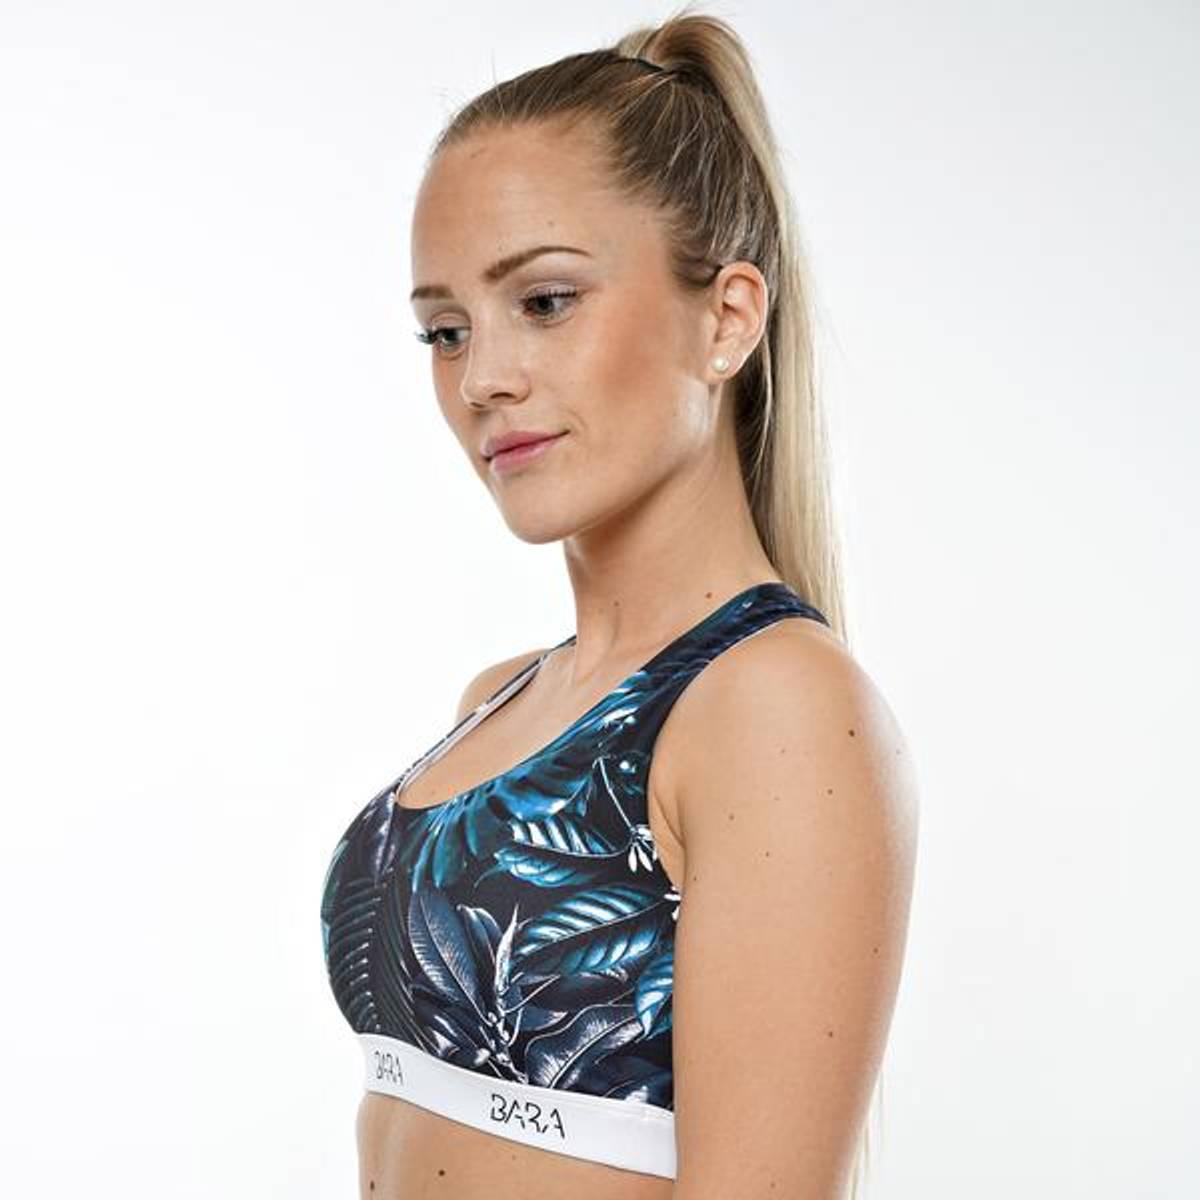 BARA Sportswear - Tundra Sportsbra